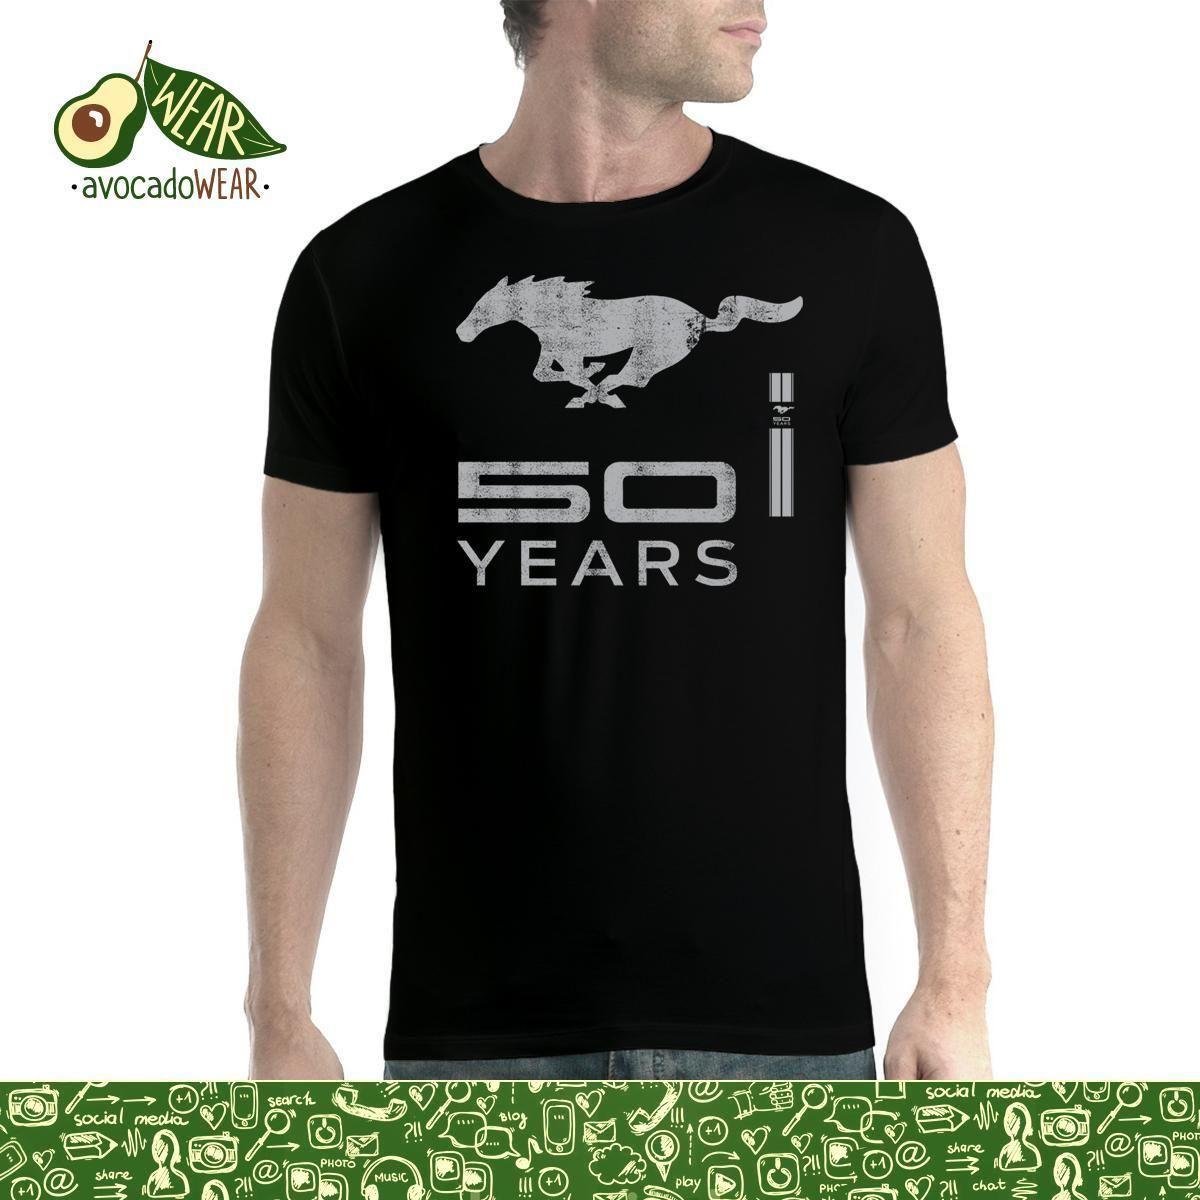 Ford Mustang 50 ANS LOGO ARGENTé T-Shirt Hommes XS-5XL